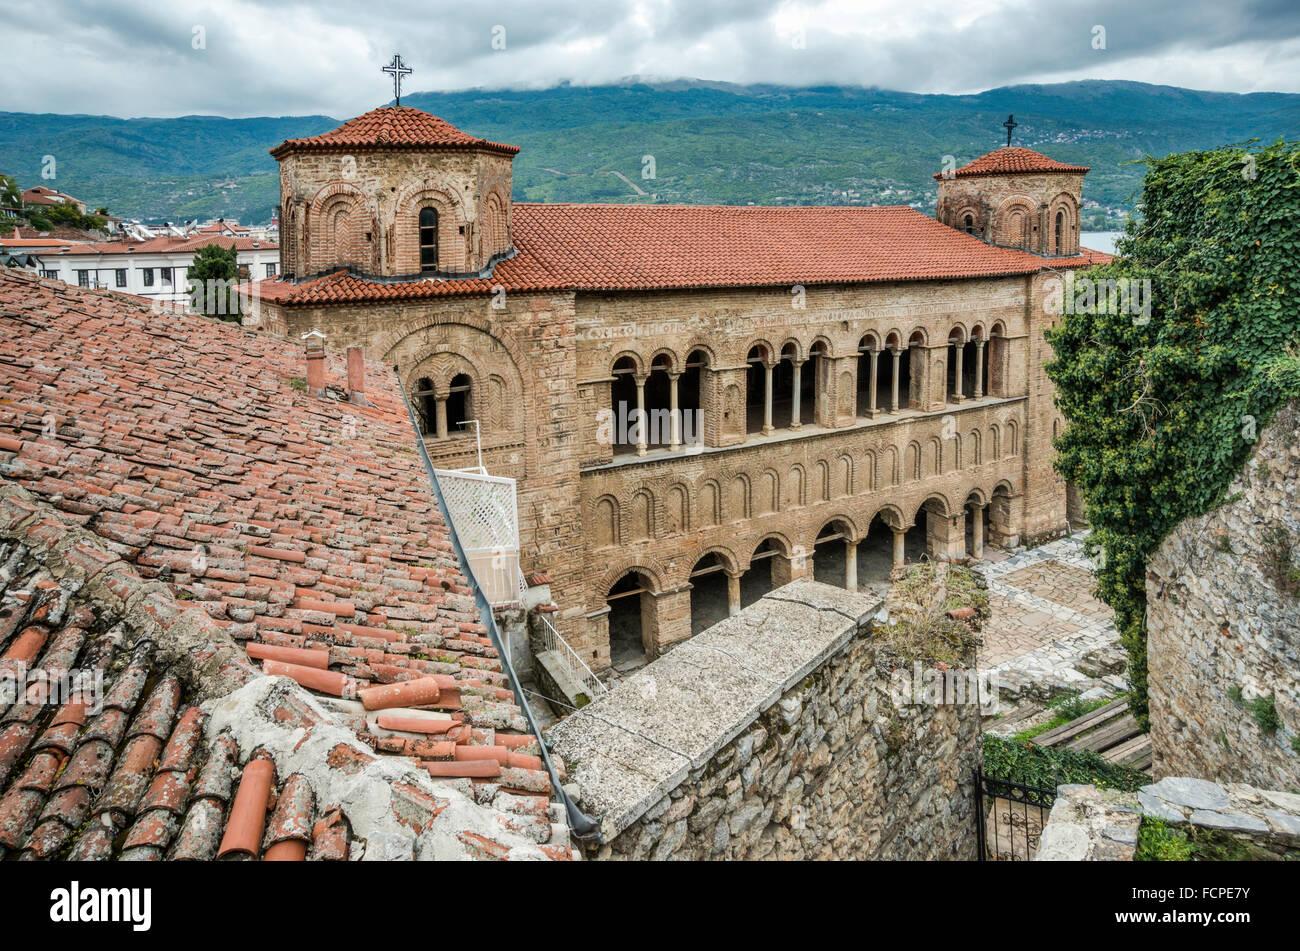 Church of St Sophia (Sveta Sofija), Macedonian Orthodox church in Ohrid, UNESCO World Heritage Site, Republic of - Stock Image